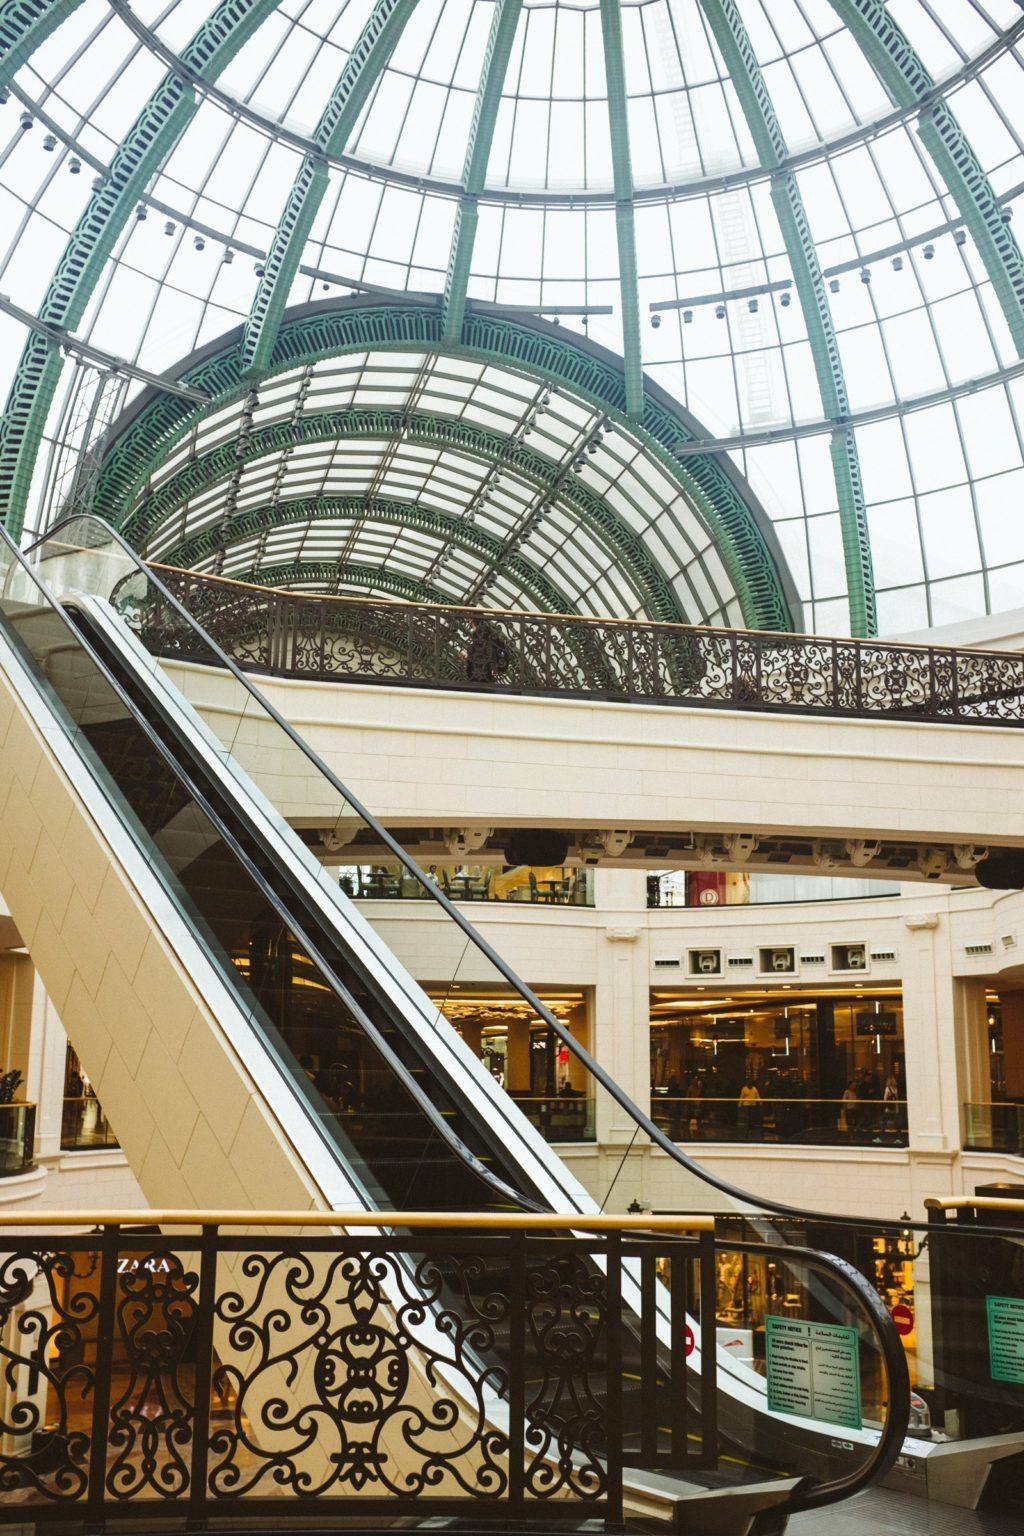 ski-dubai-indoor-skiing-mall-emirates-9408